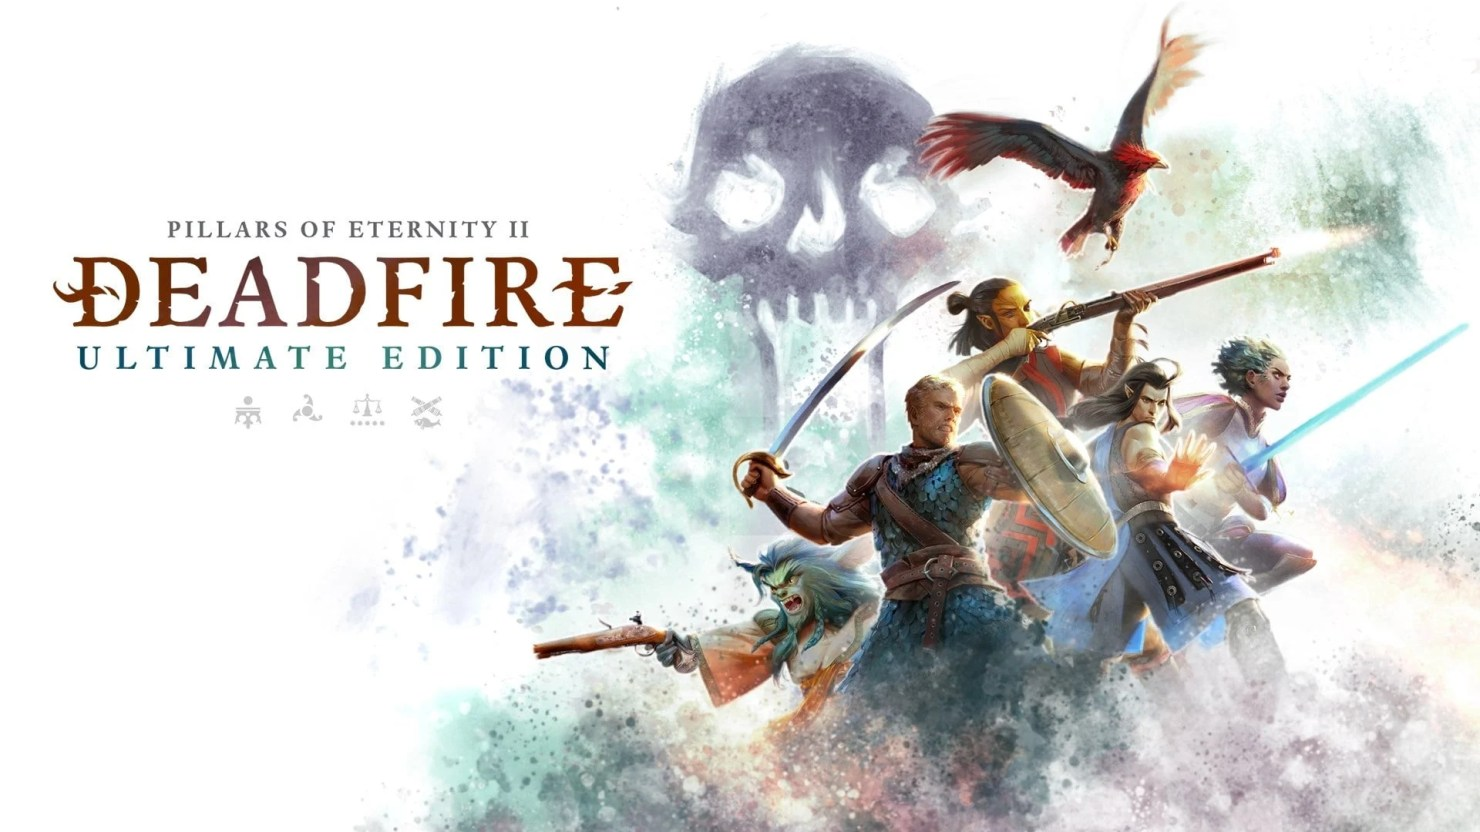 Logros de Pillars Of Eternity II: Deadfire